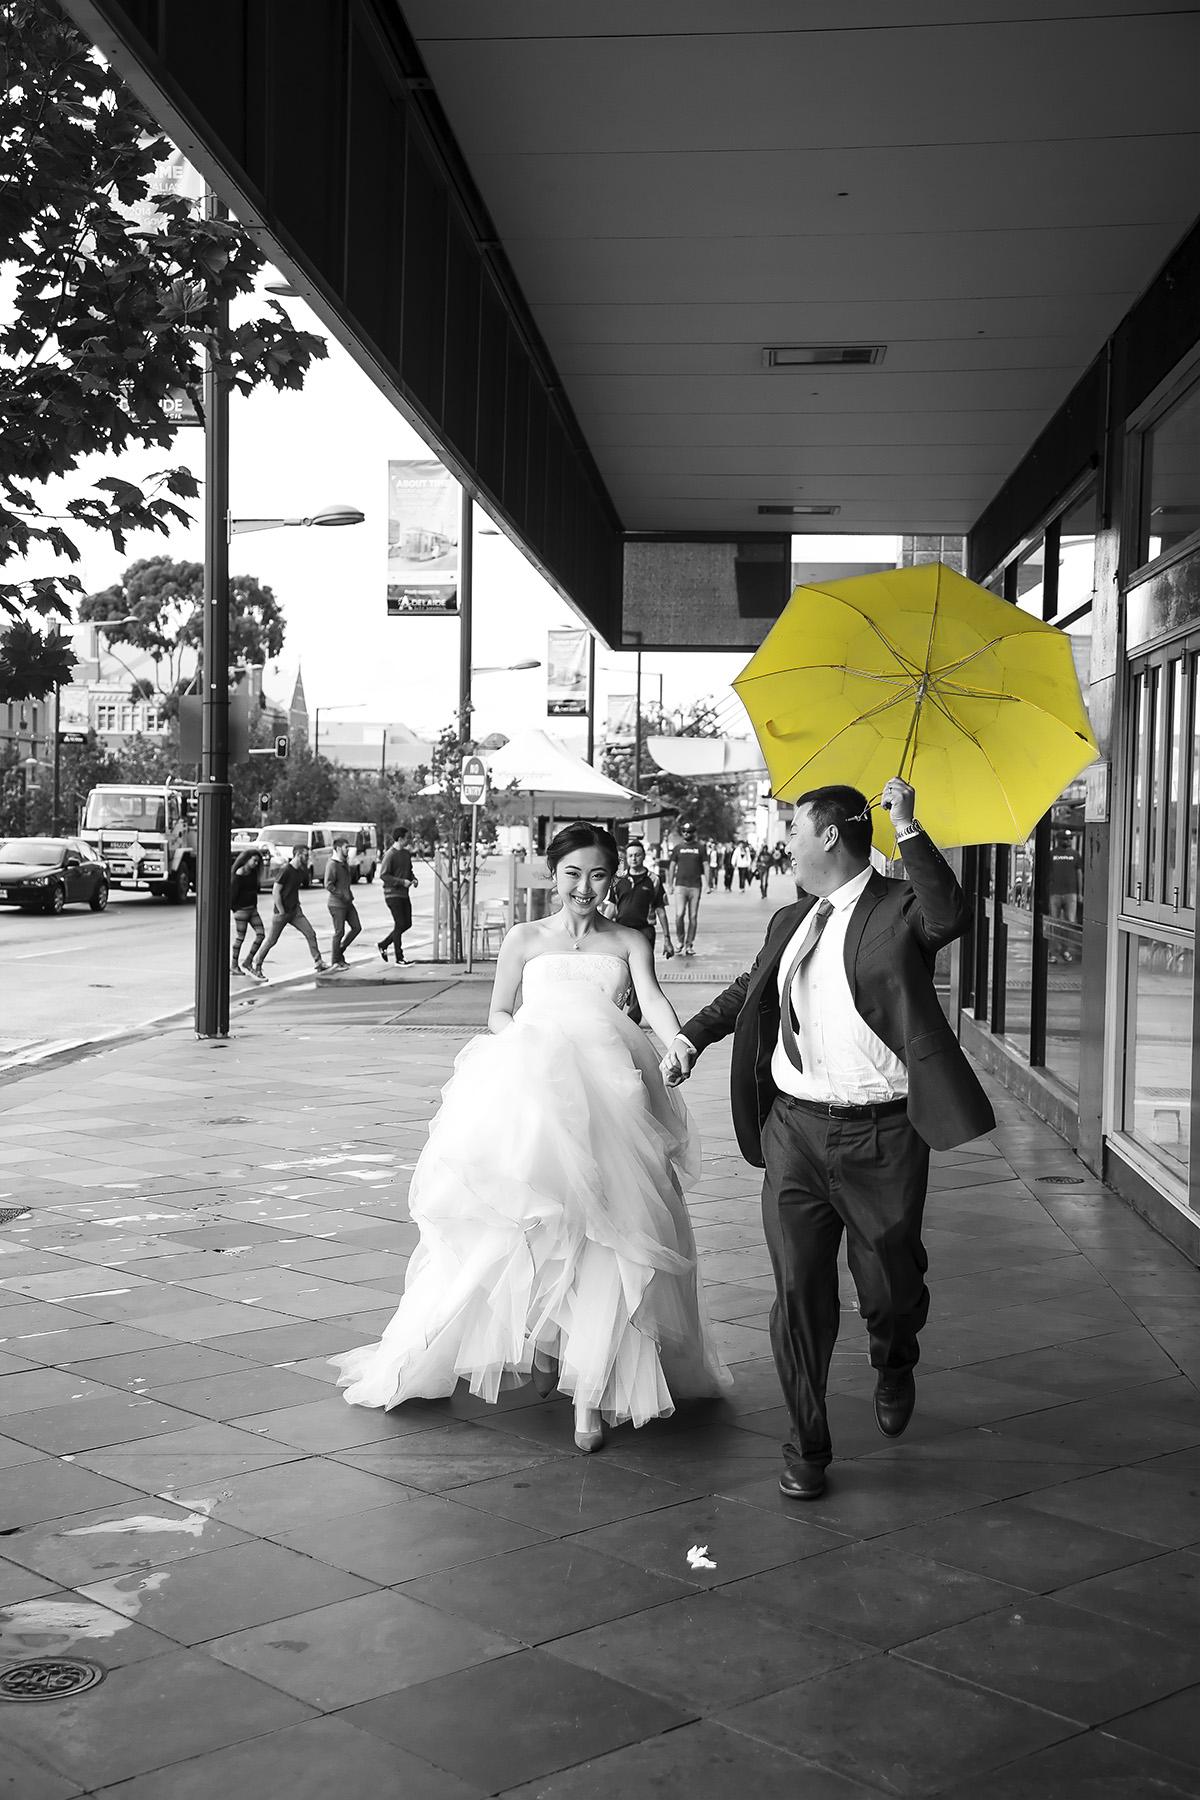 Wedding Photography Adelaide City - Running with Umbrella